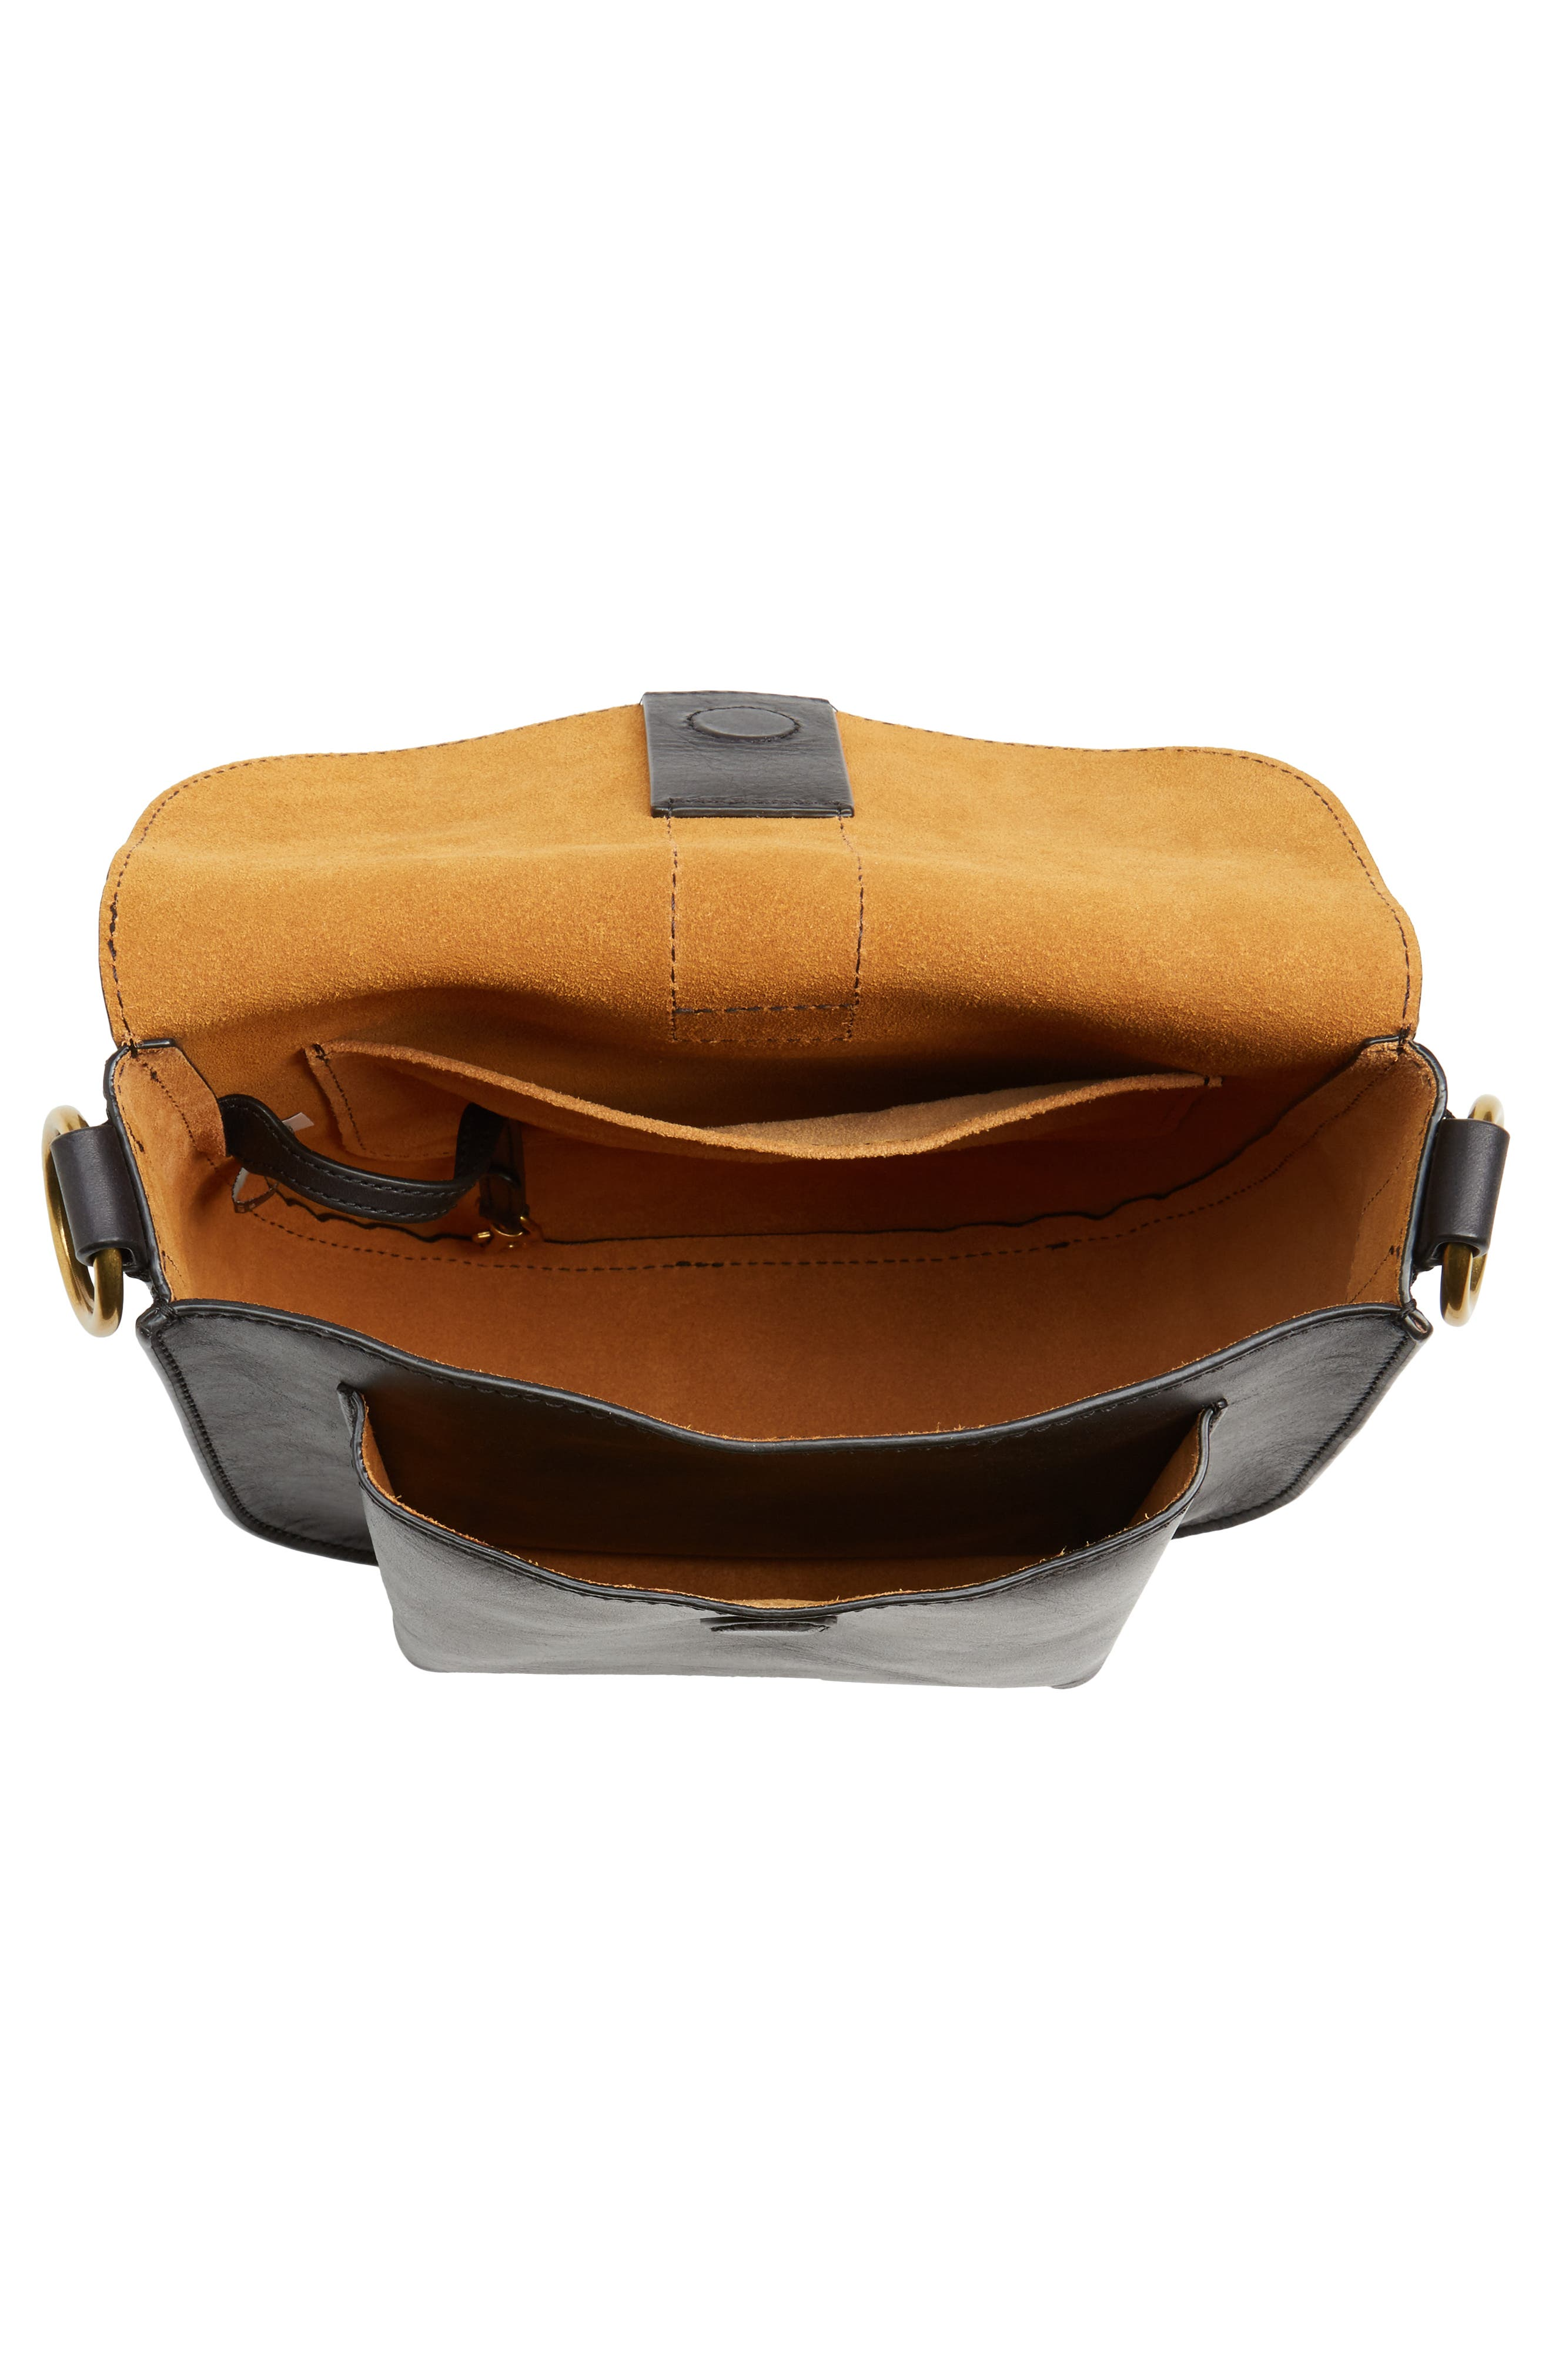 Ilana Leather Saddle Bag,                             Alternate thumbnail 4, color,                             001